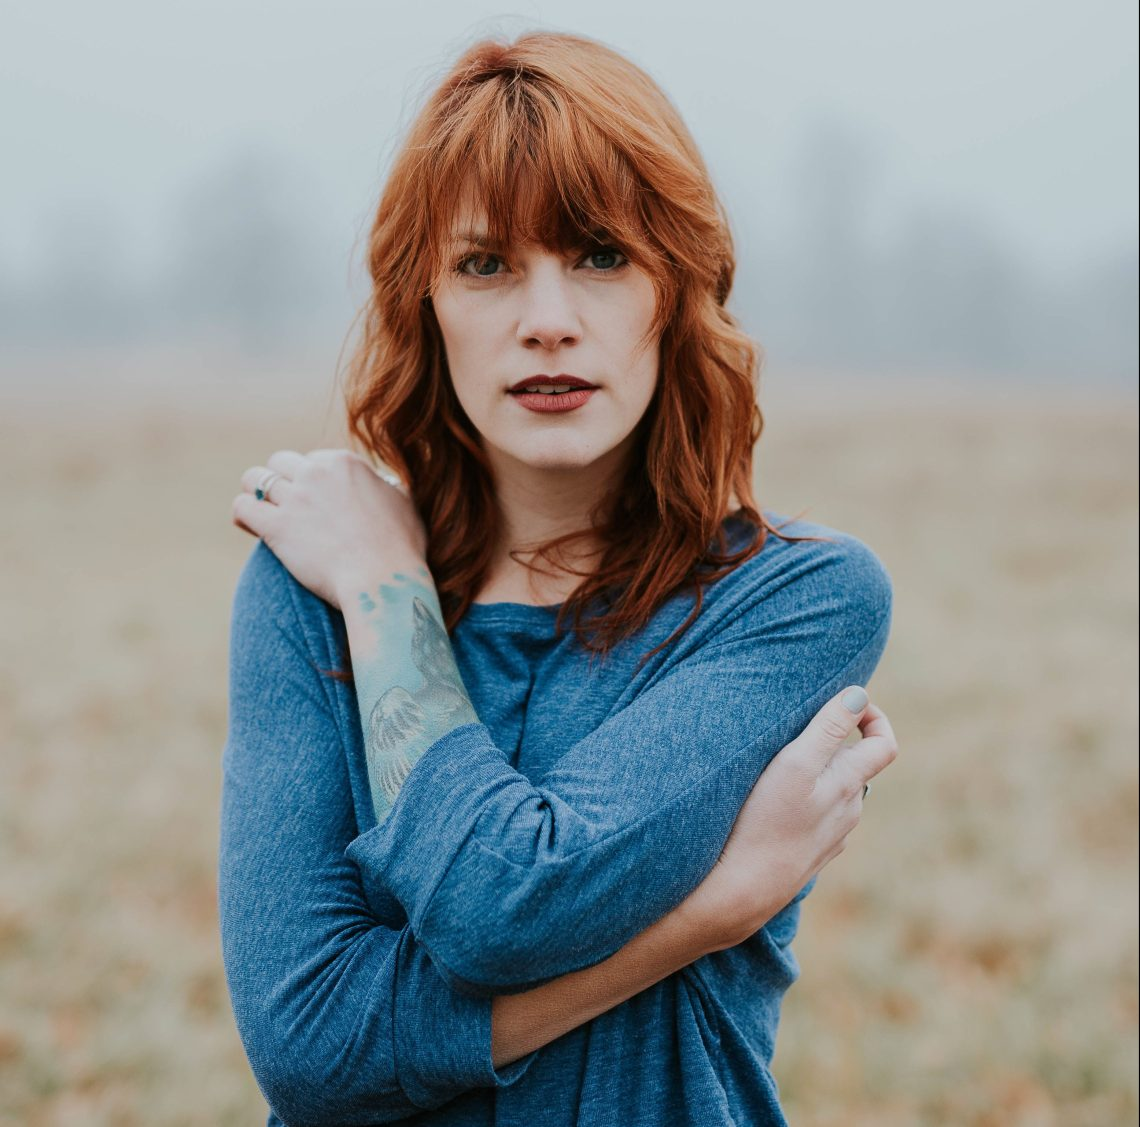 Unsplash, Brooke Cagle